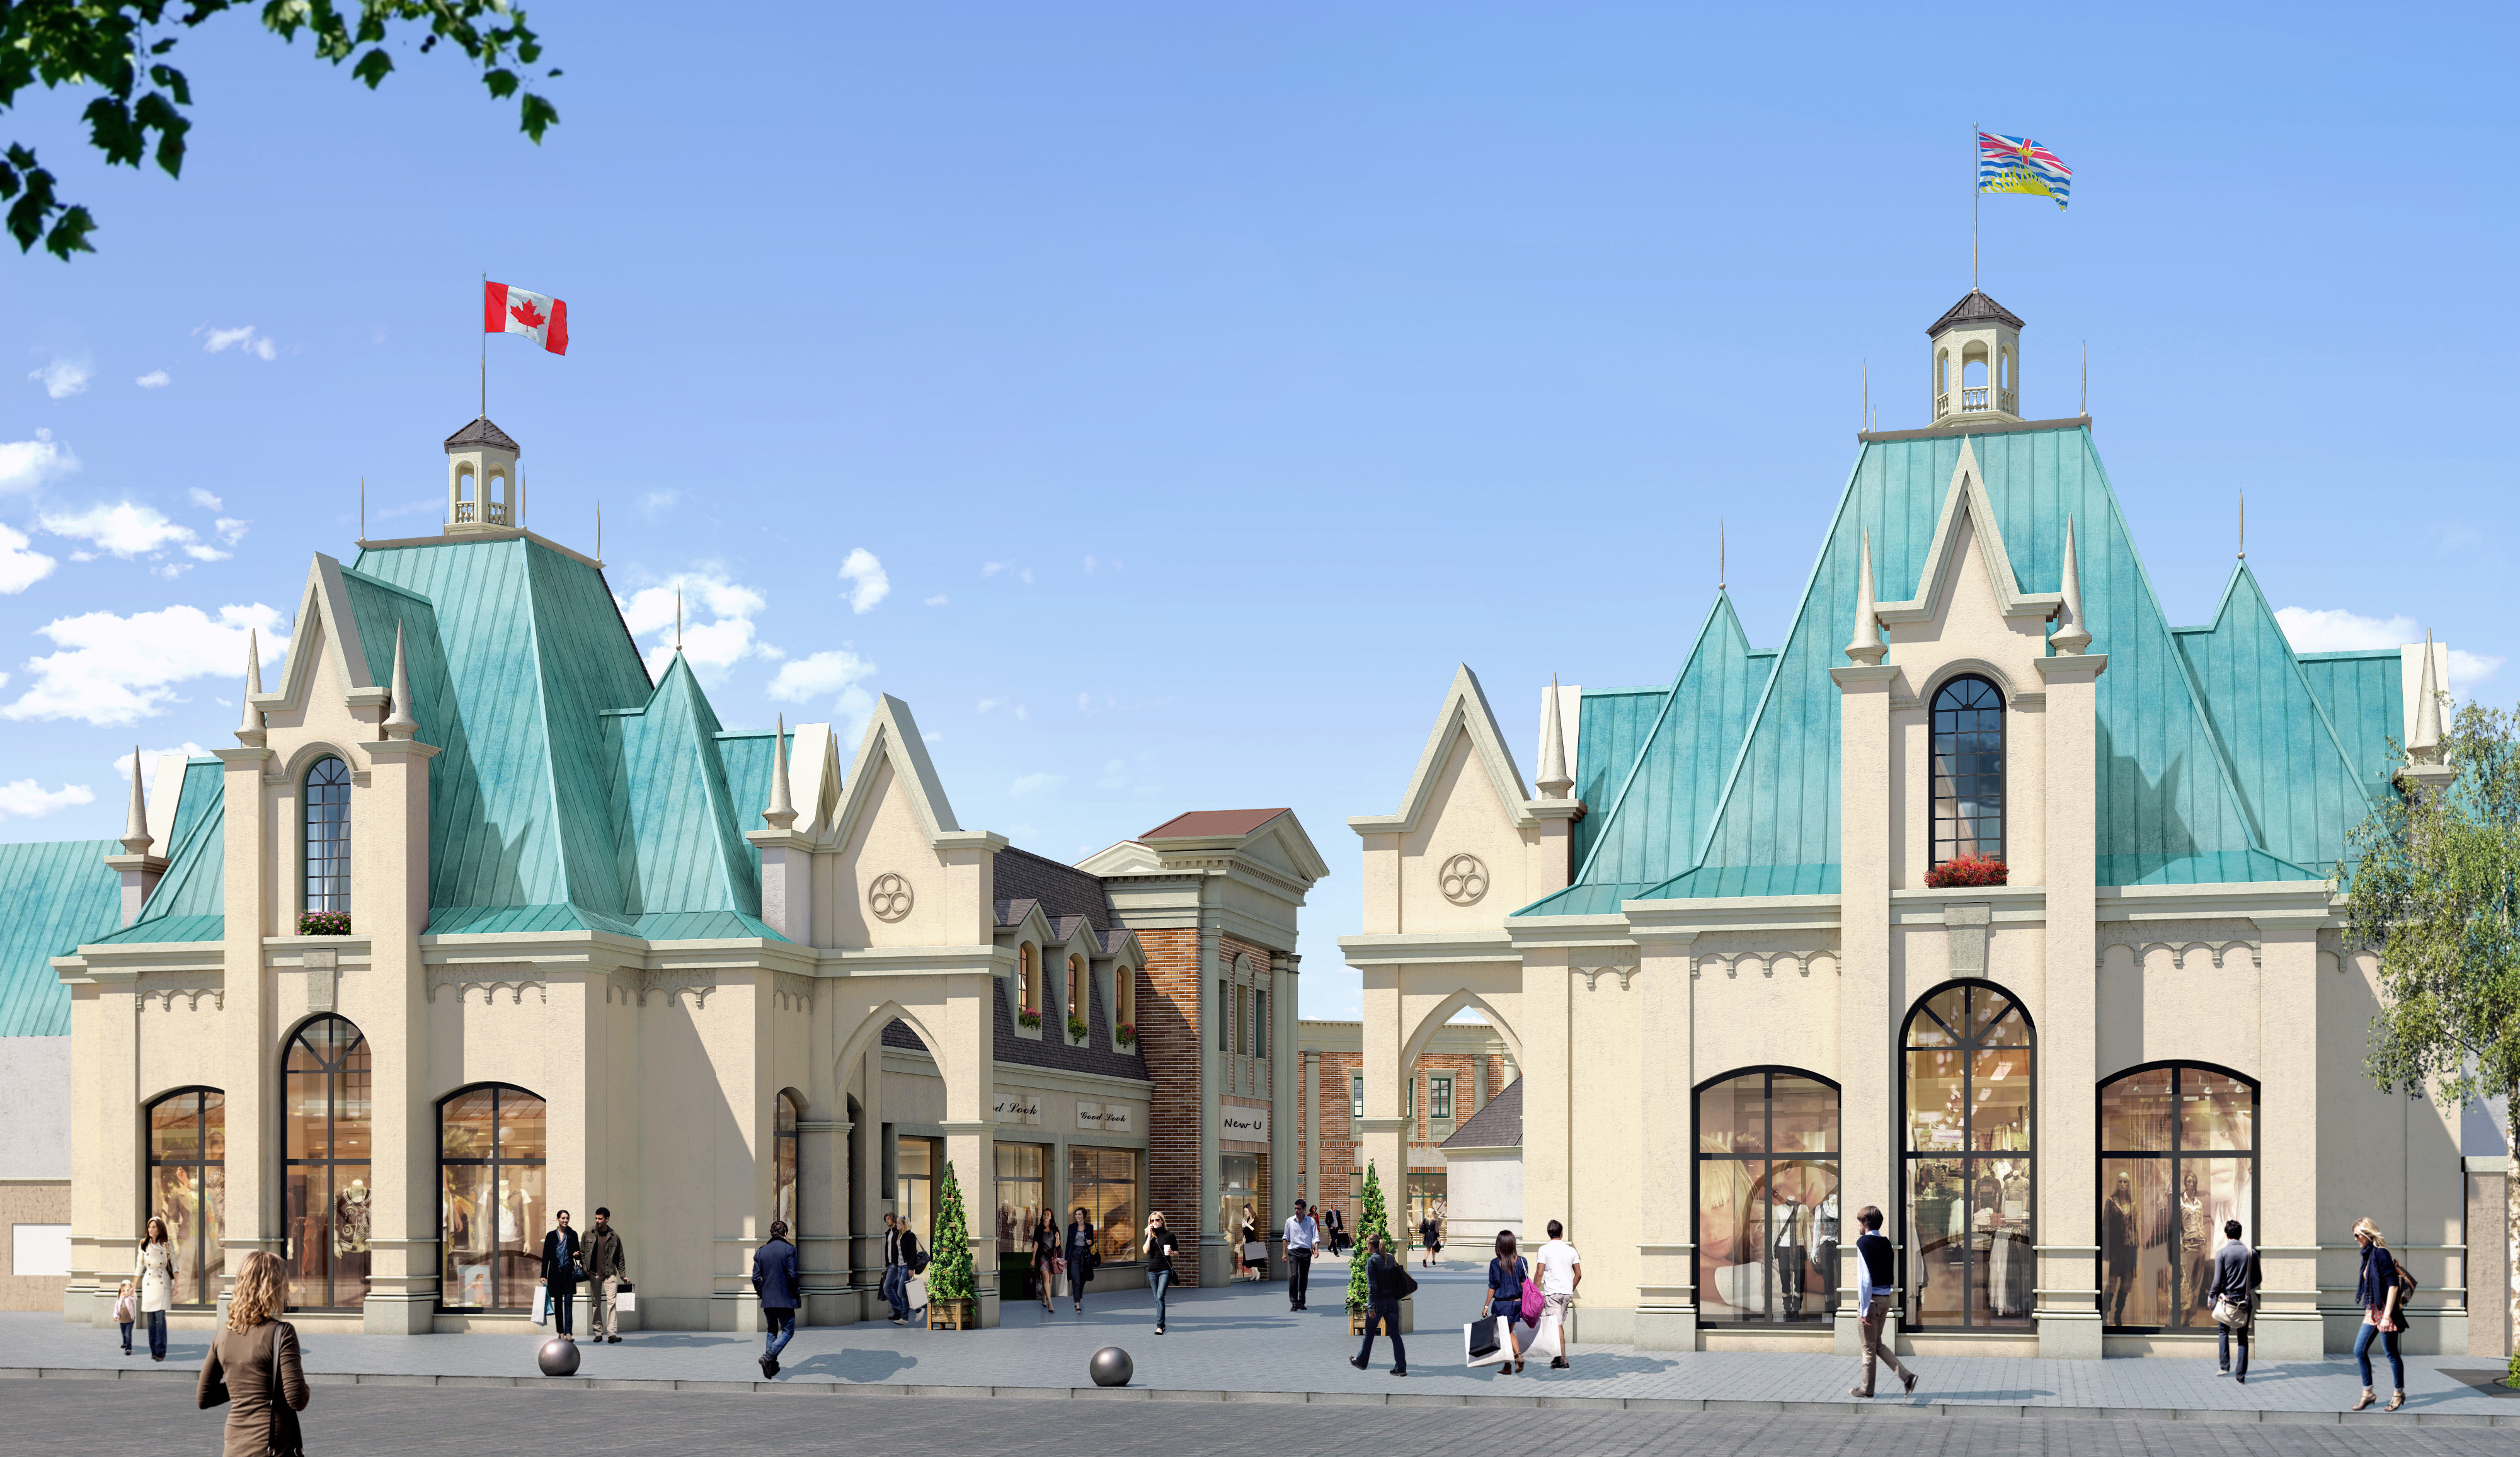 New luxury shopping centre near yvr holds job fair news 1130 for Last design outlet